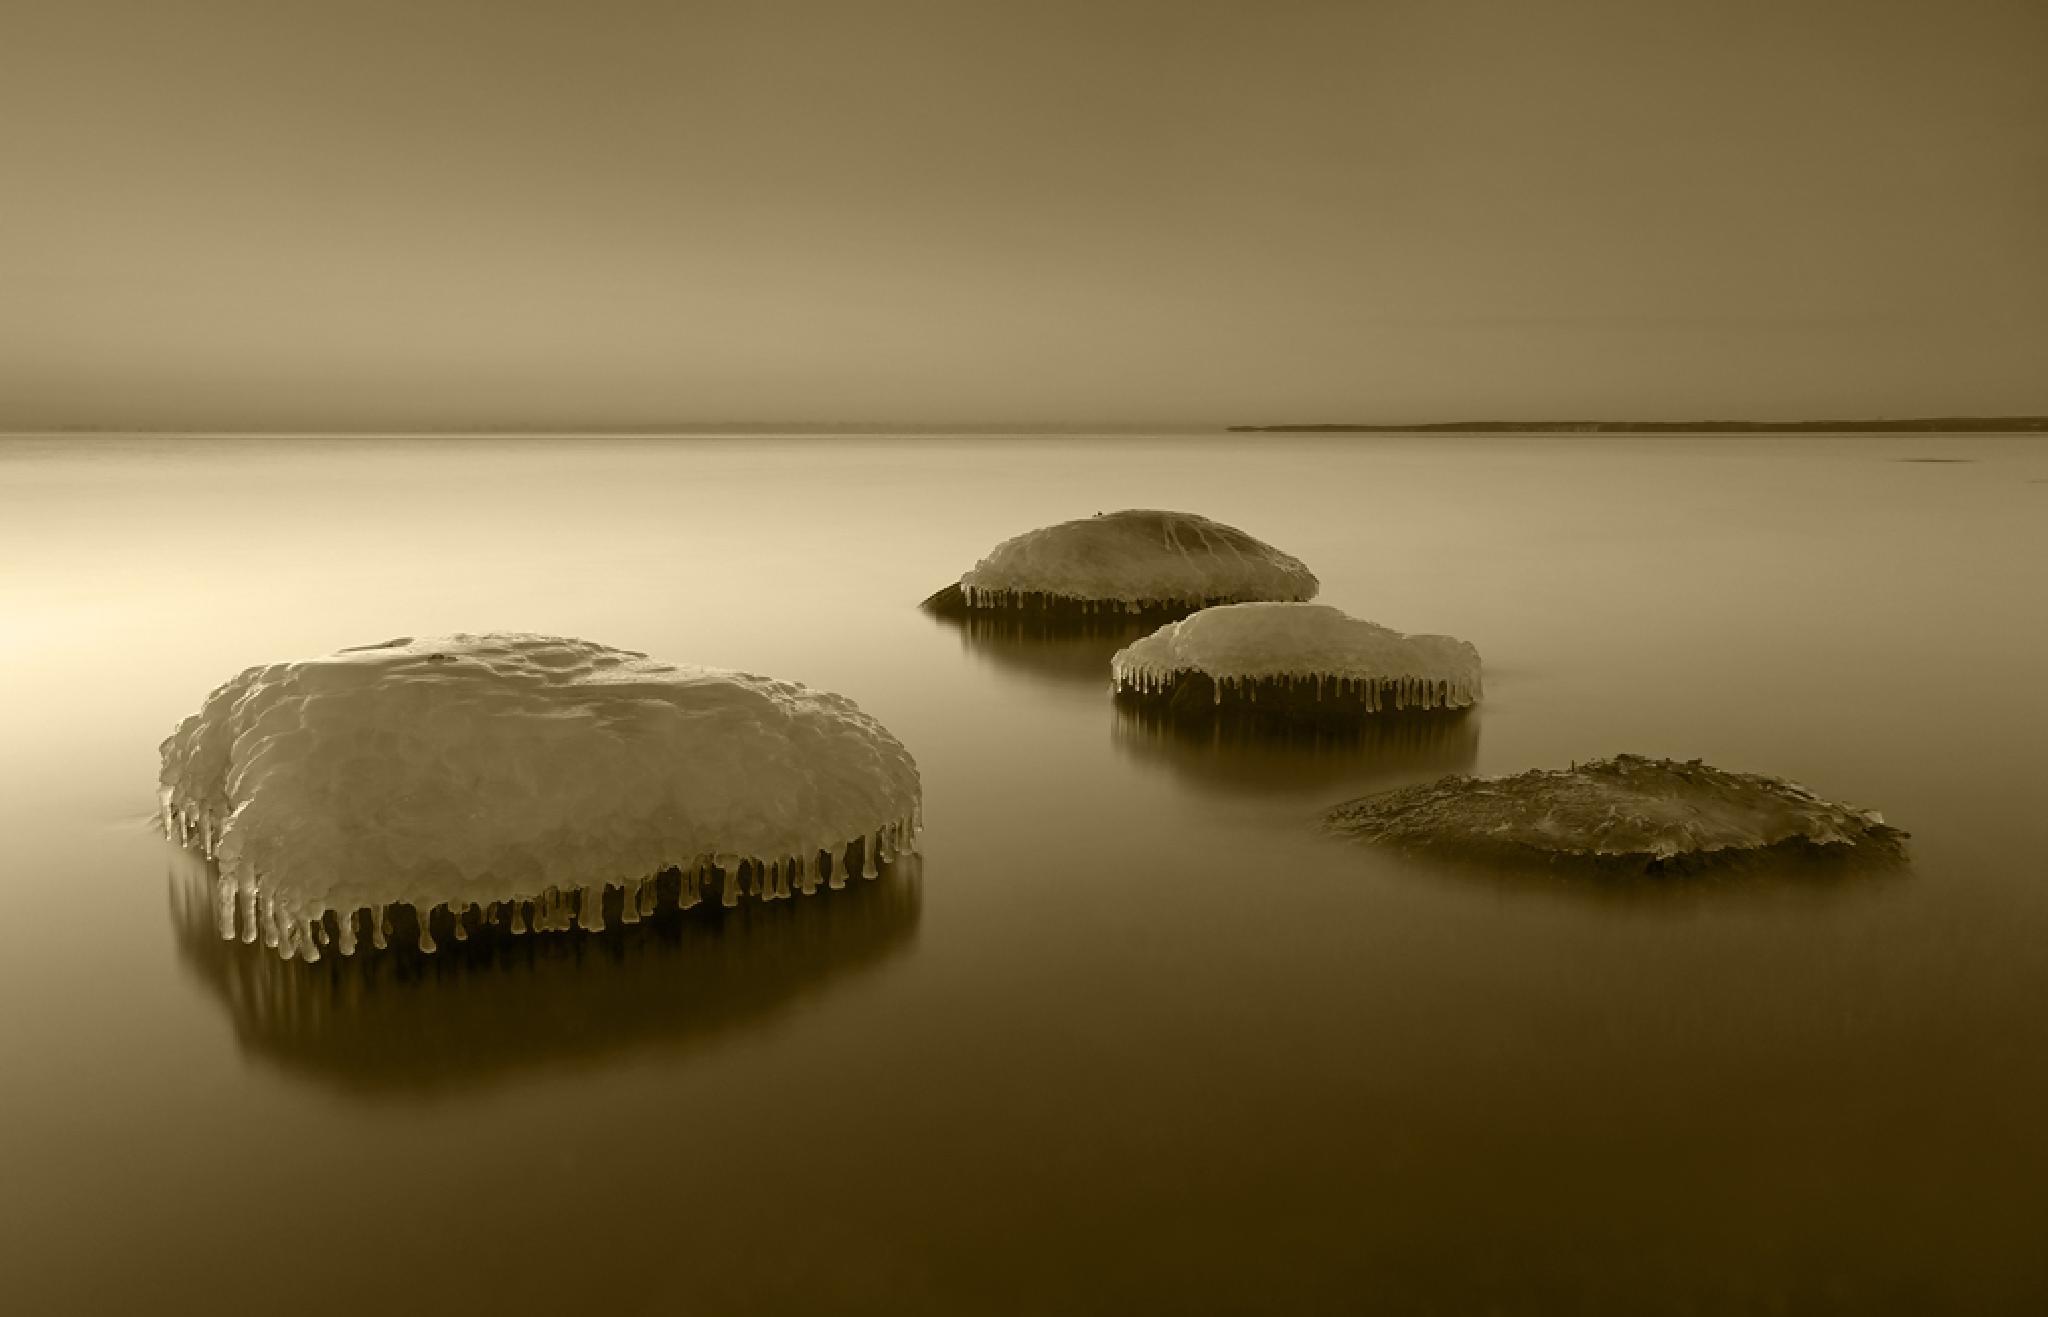 Four stones  by Peter Samuelsson